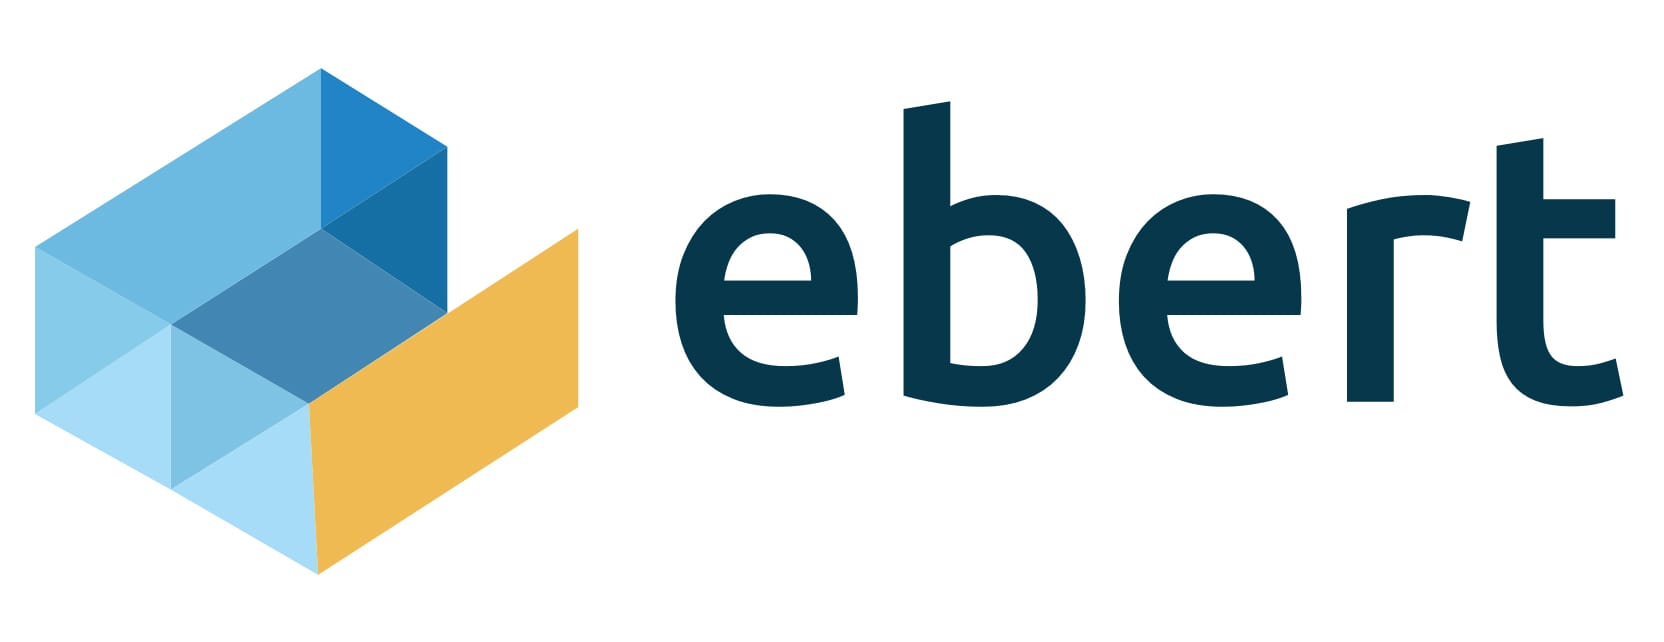 Ebert App